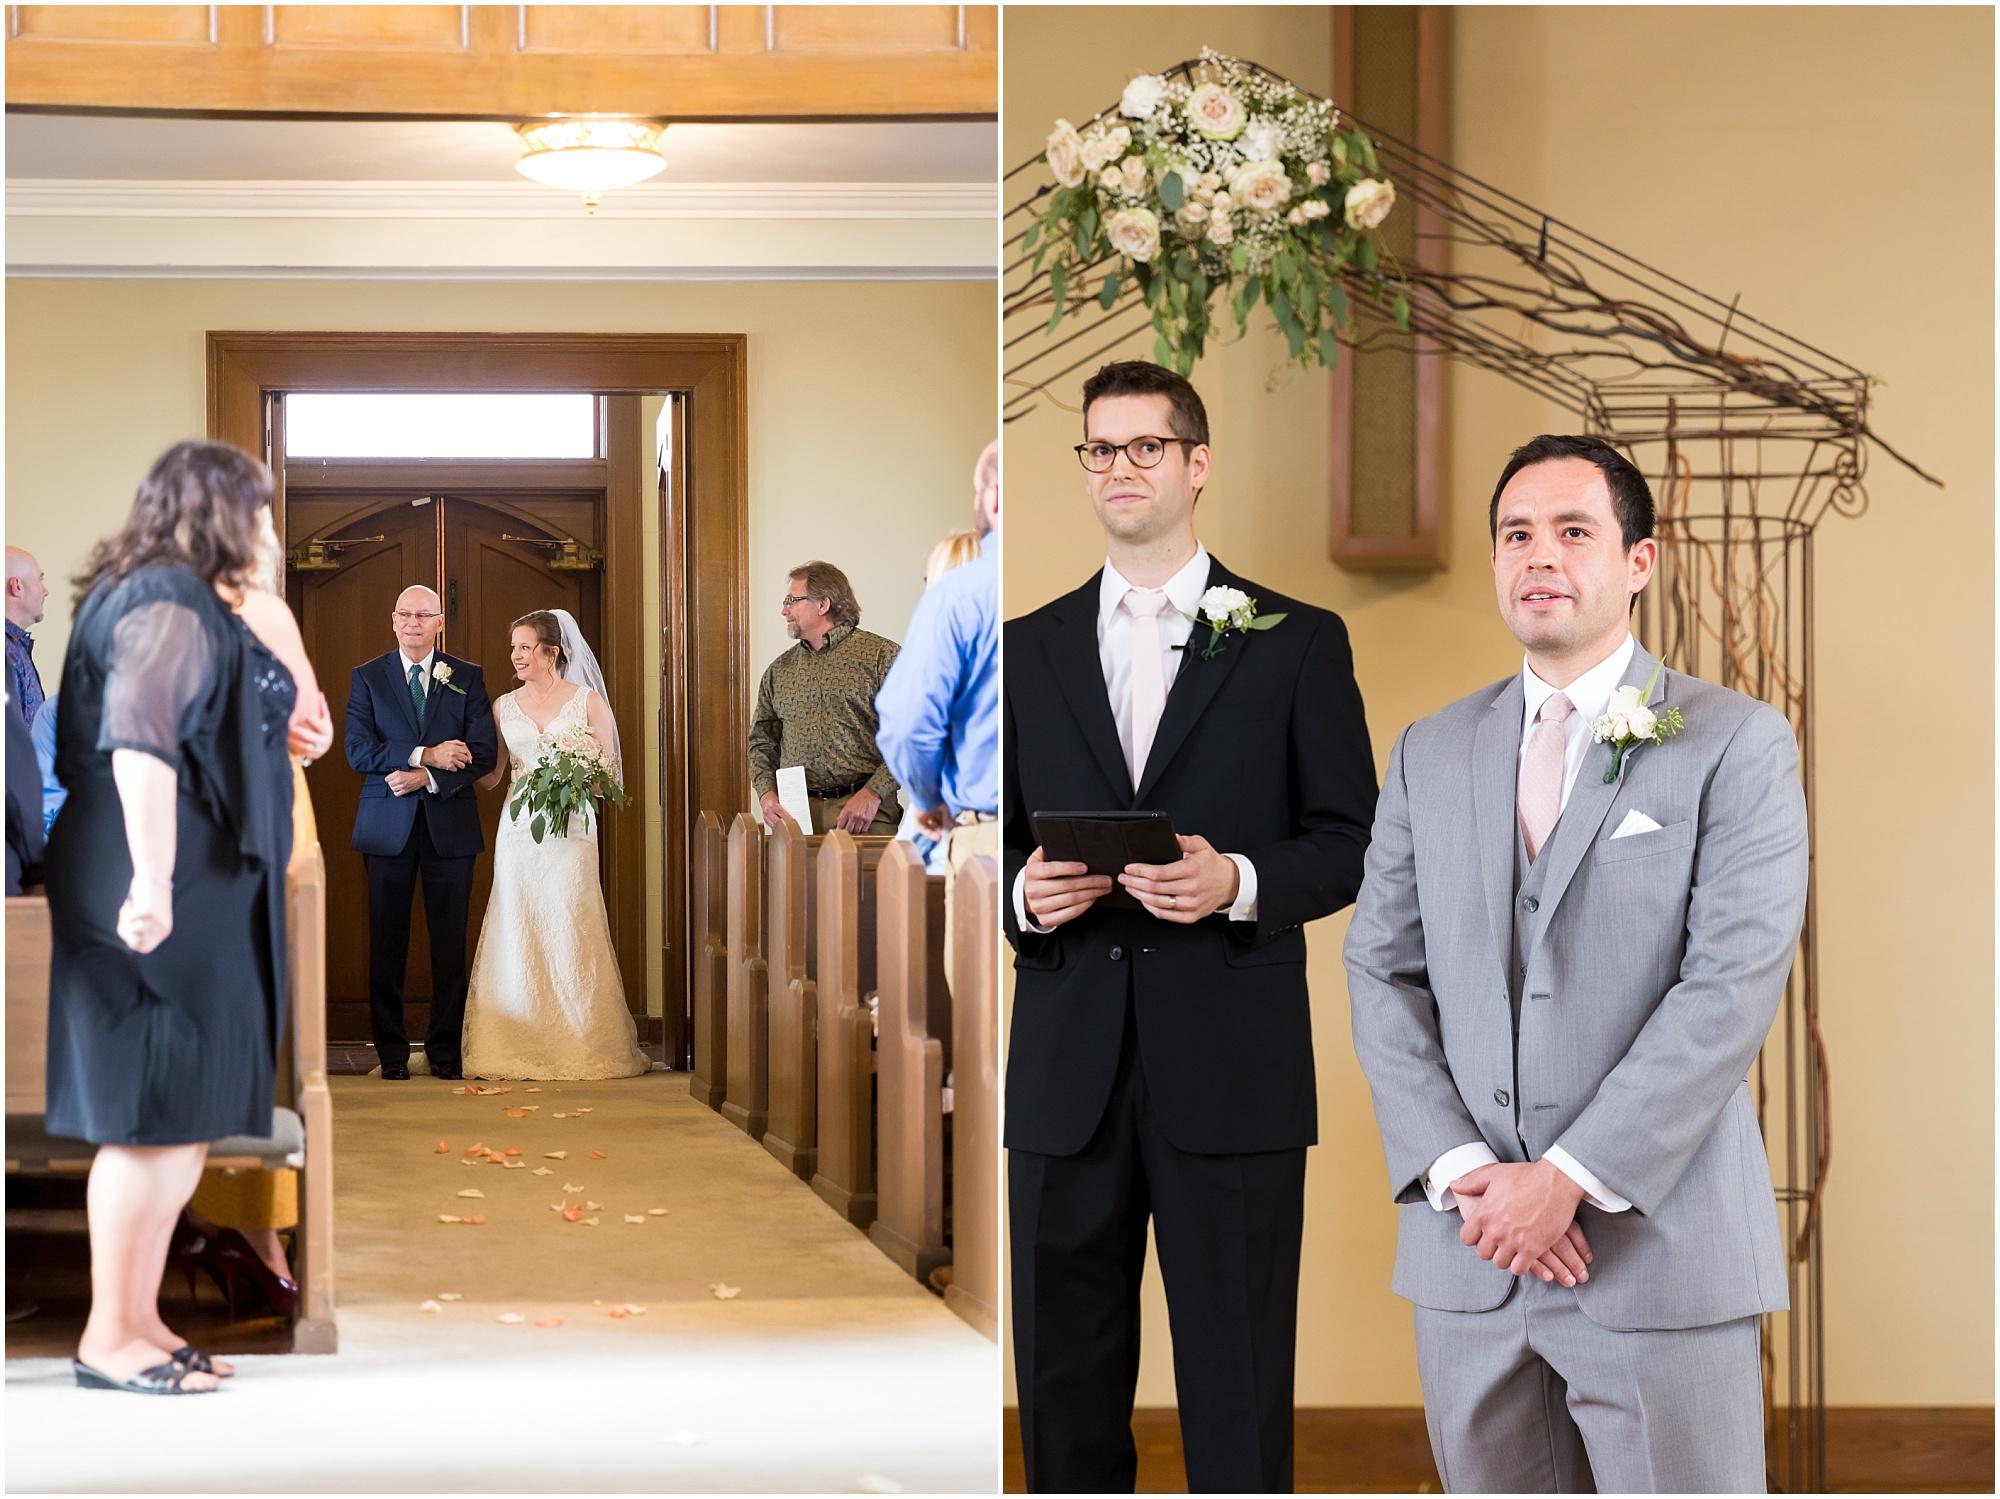 Downtown-Waco-Fall-Wedding_0010.jpg